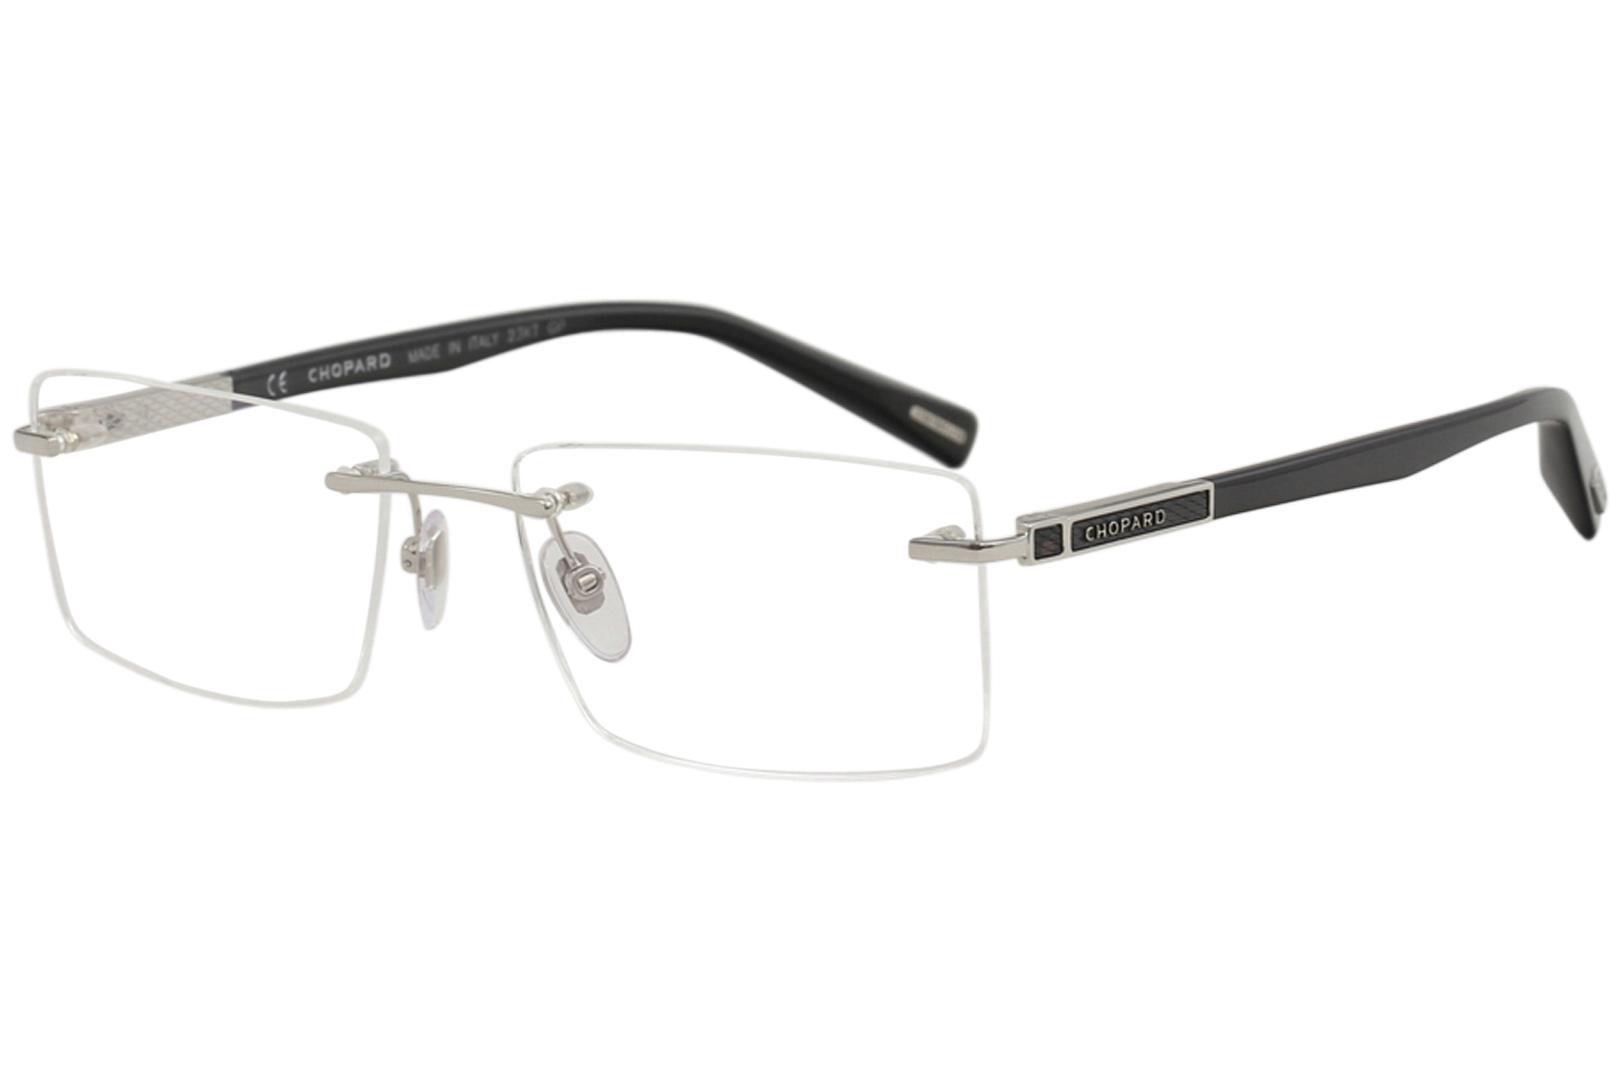 c8ccf0c0cc Chopard Men s Eyeglasses VCHB93 VCH B93 Rimless Optical Frame